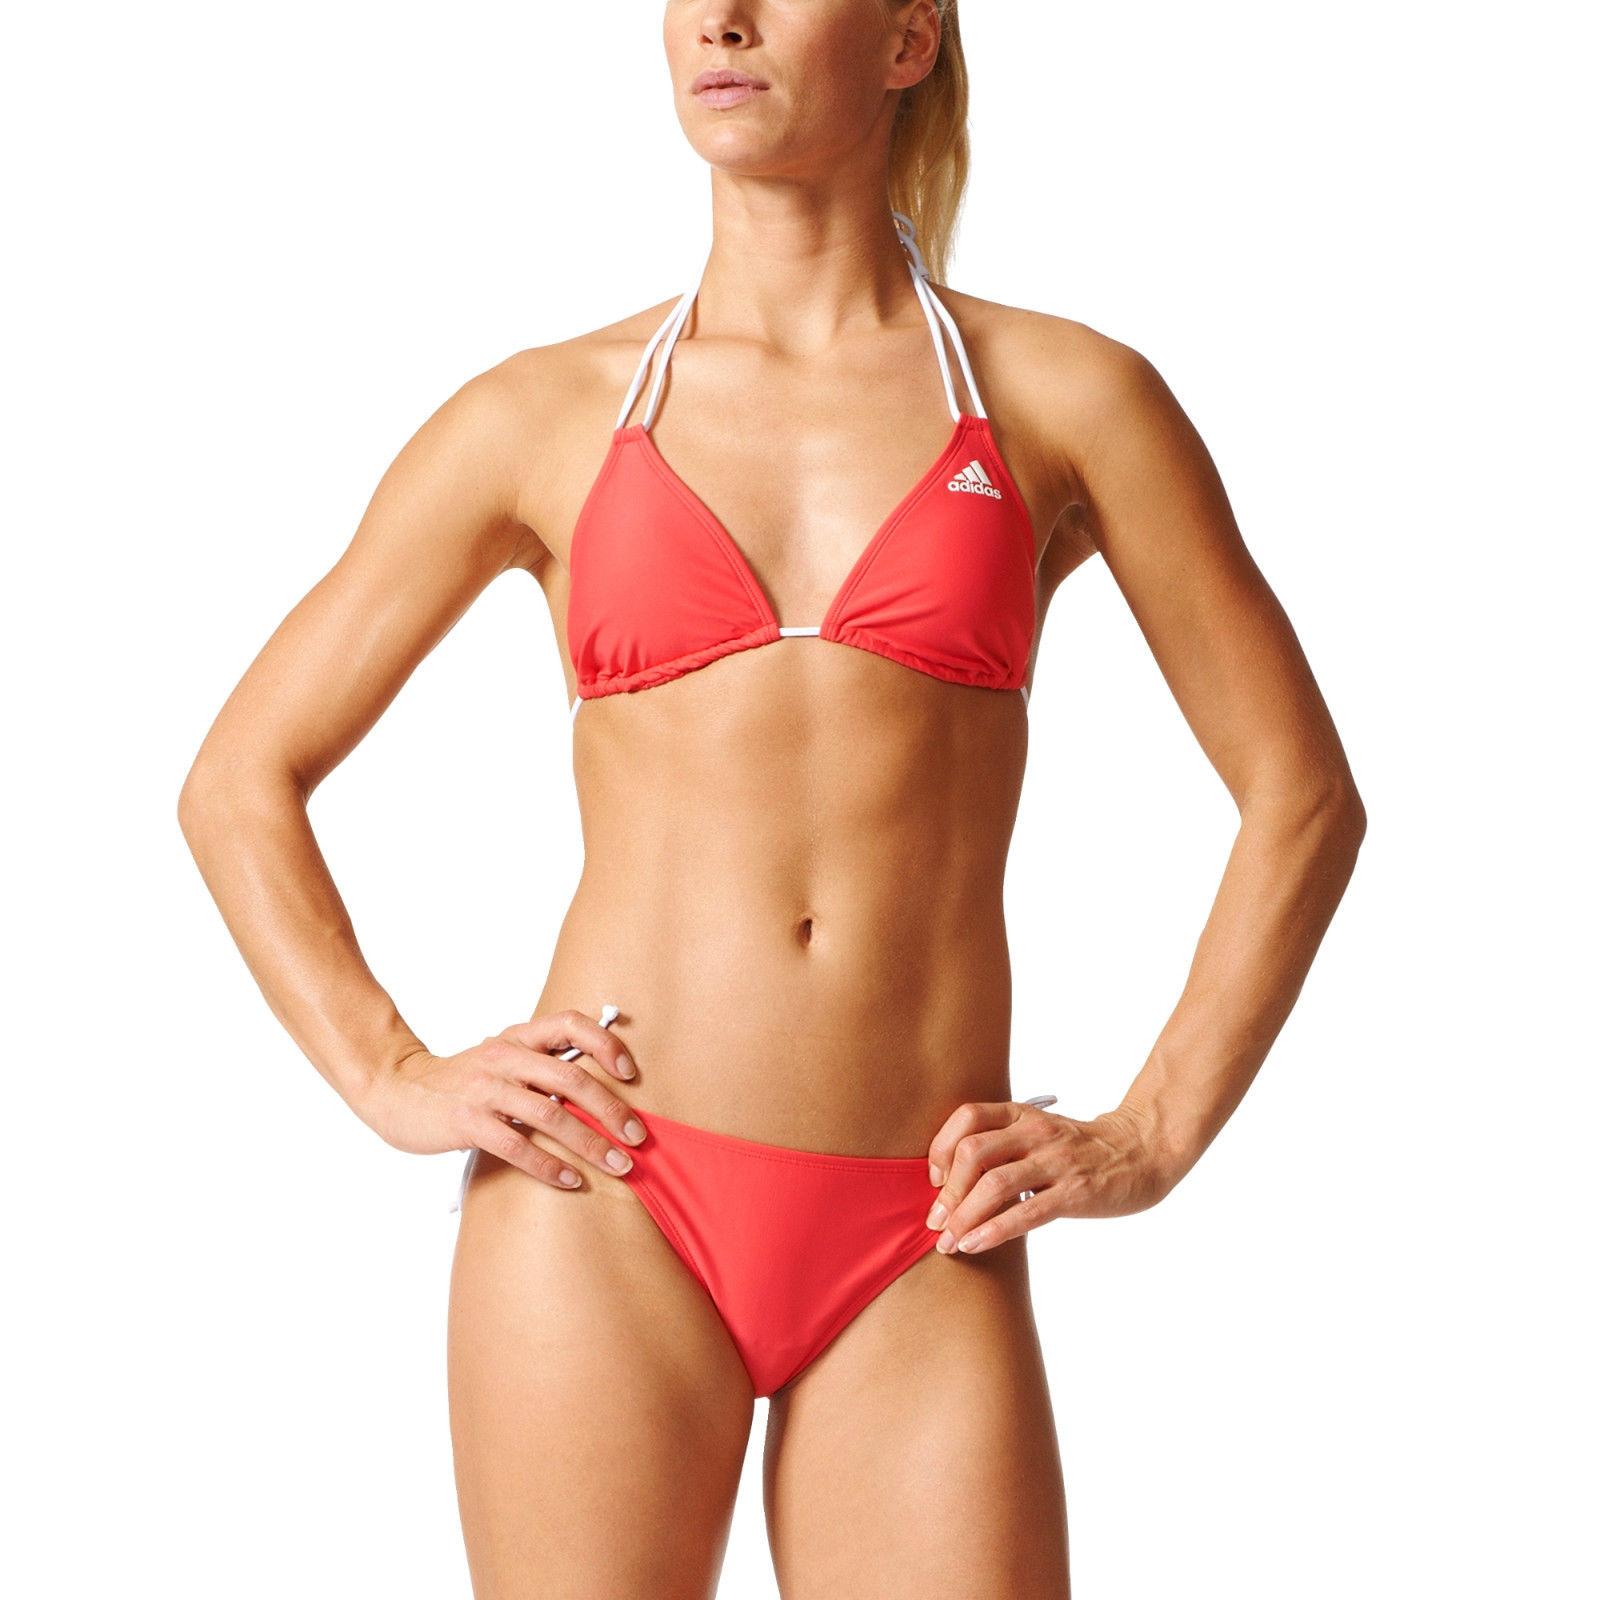 Adidas Women Bikini Swimming Solid Triangle Pink Beach BJ9861 Summer 2017 New